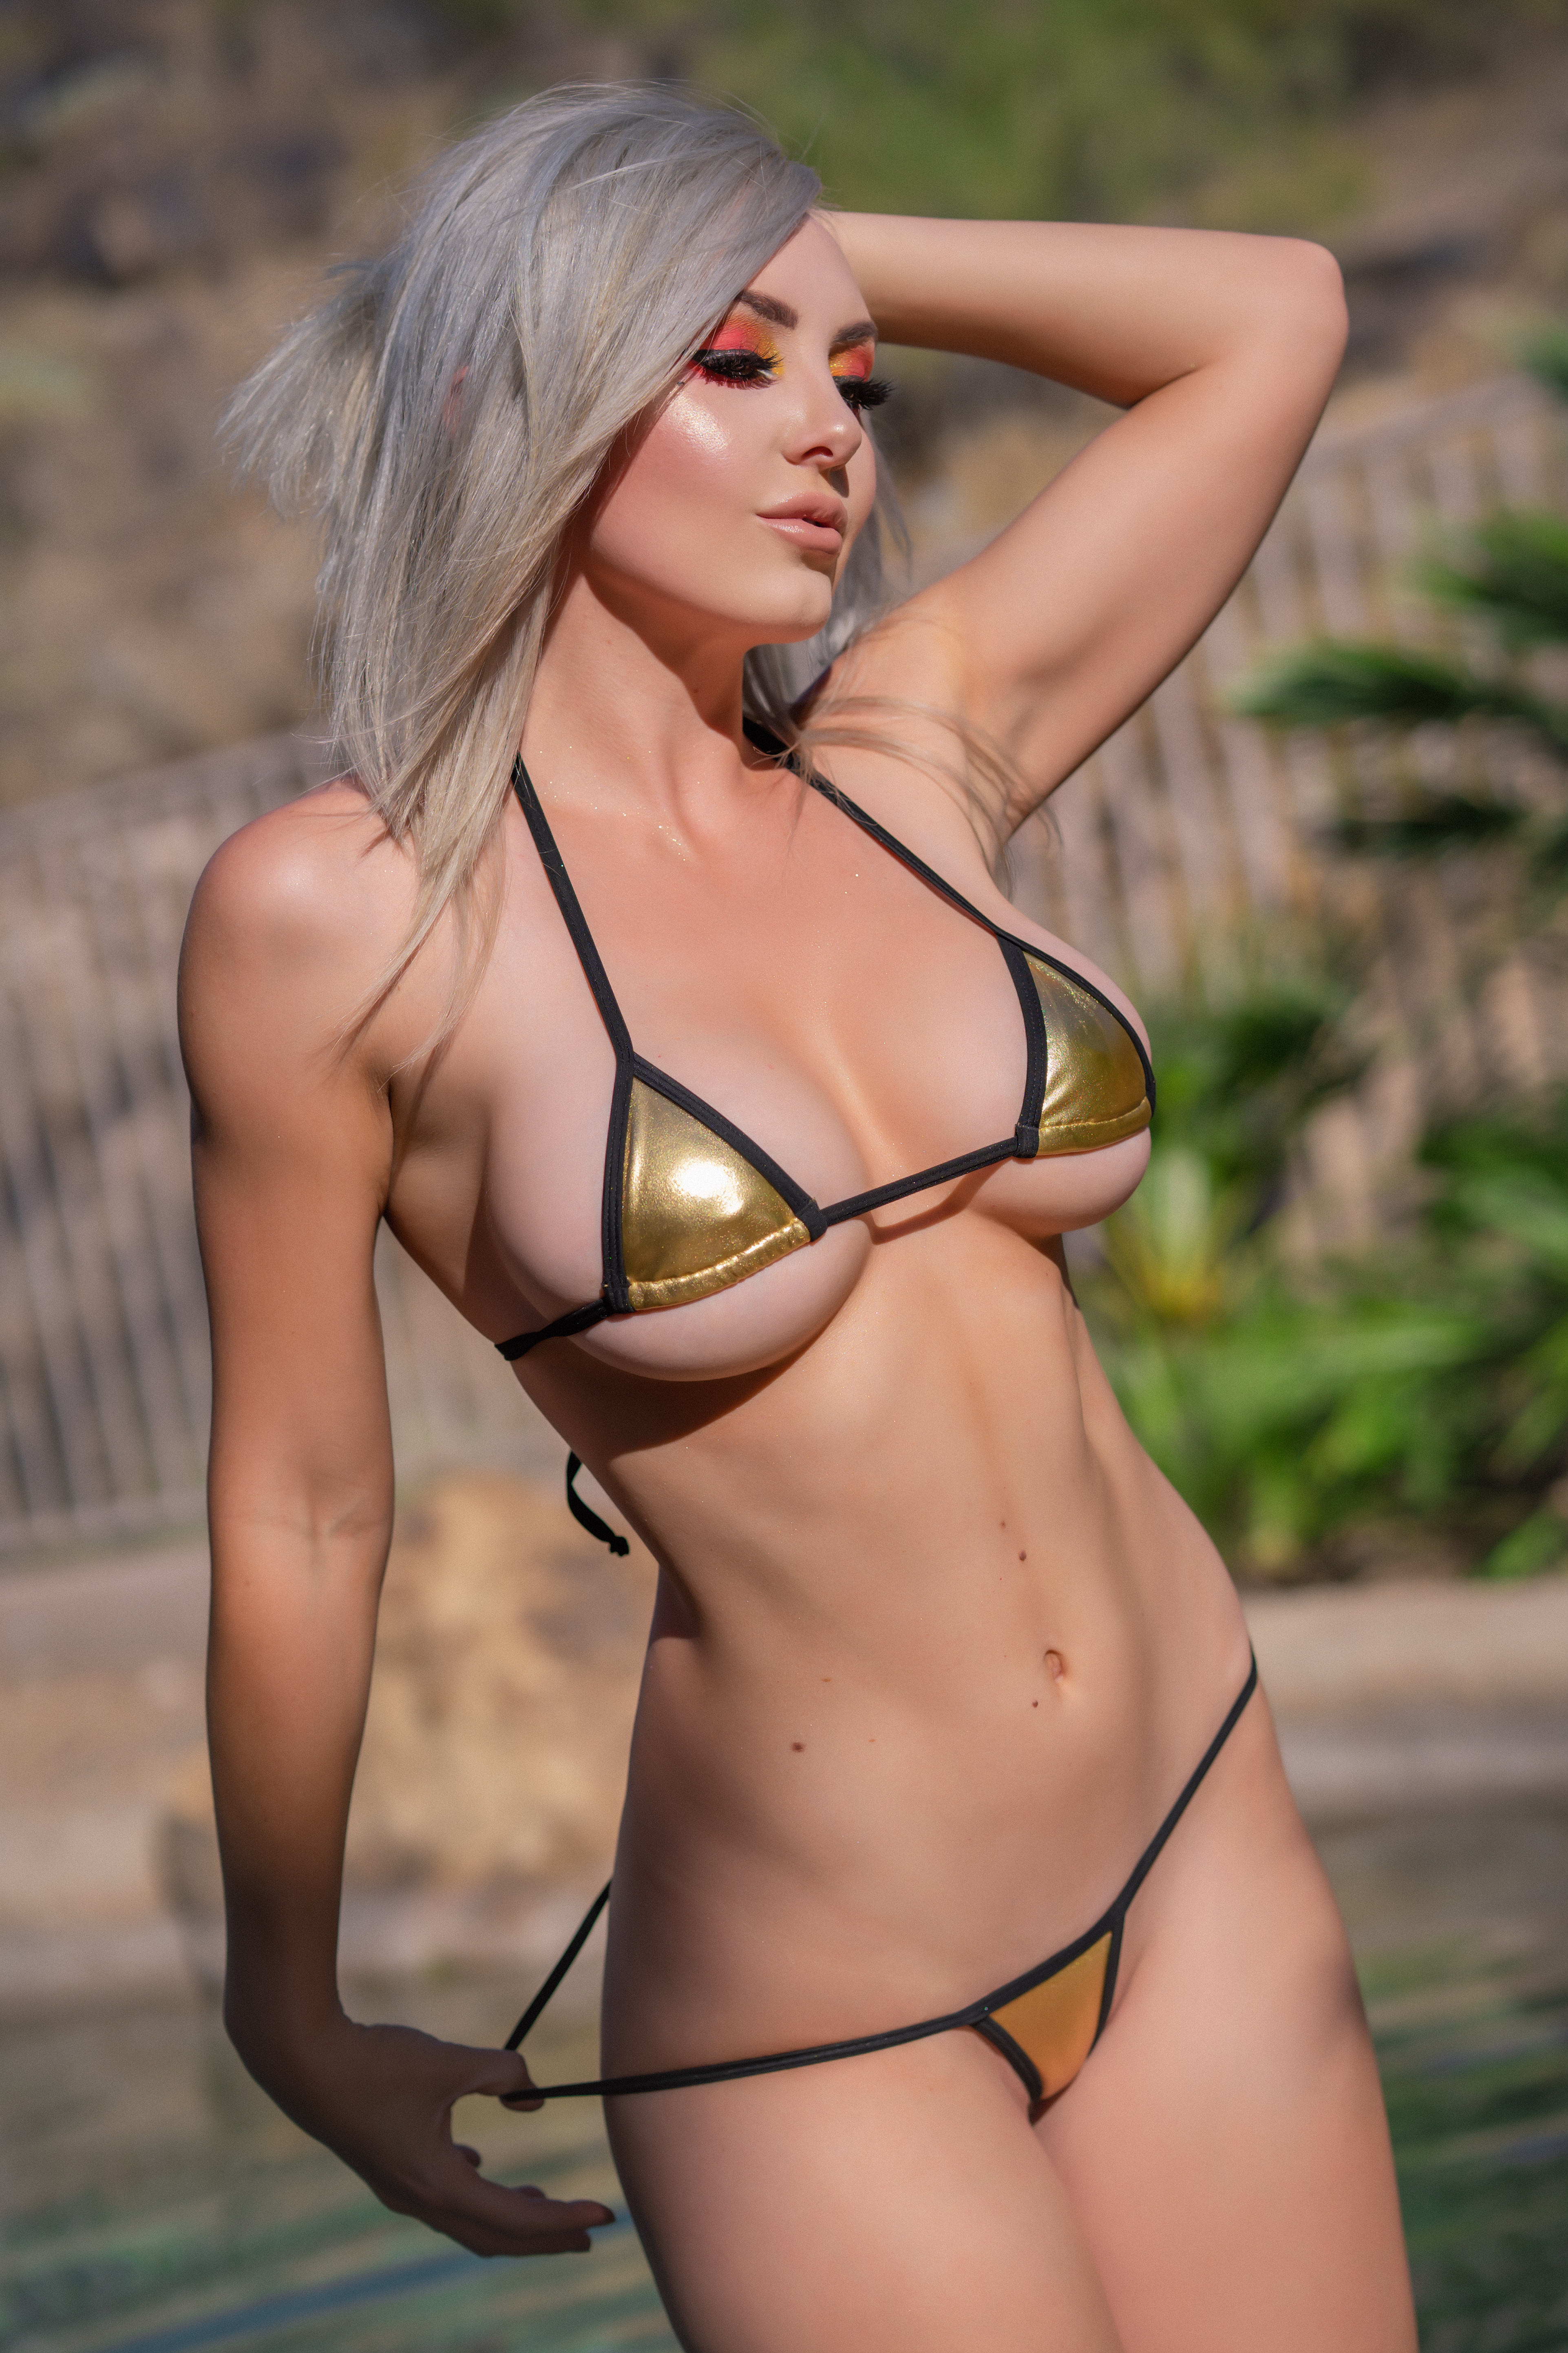 People 3846x5770 Jessica Nigri cosplay women blonde bikini pulling panties